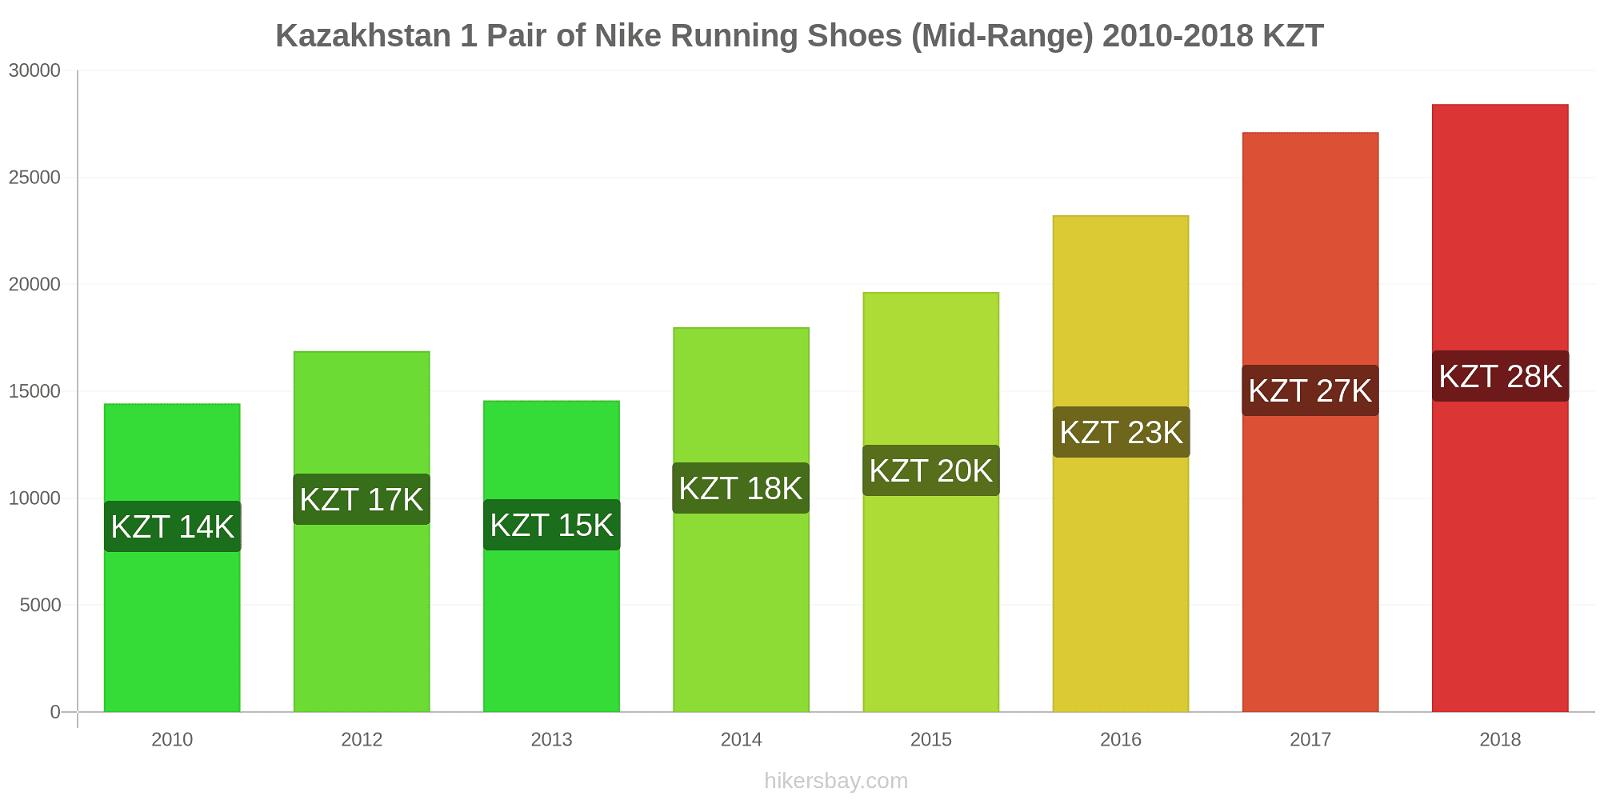 Kazakhstan price changes 1 Pair of Nike Running Shoes (Mid-Range) hikersbay.com